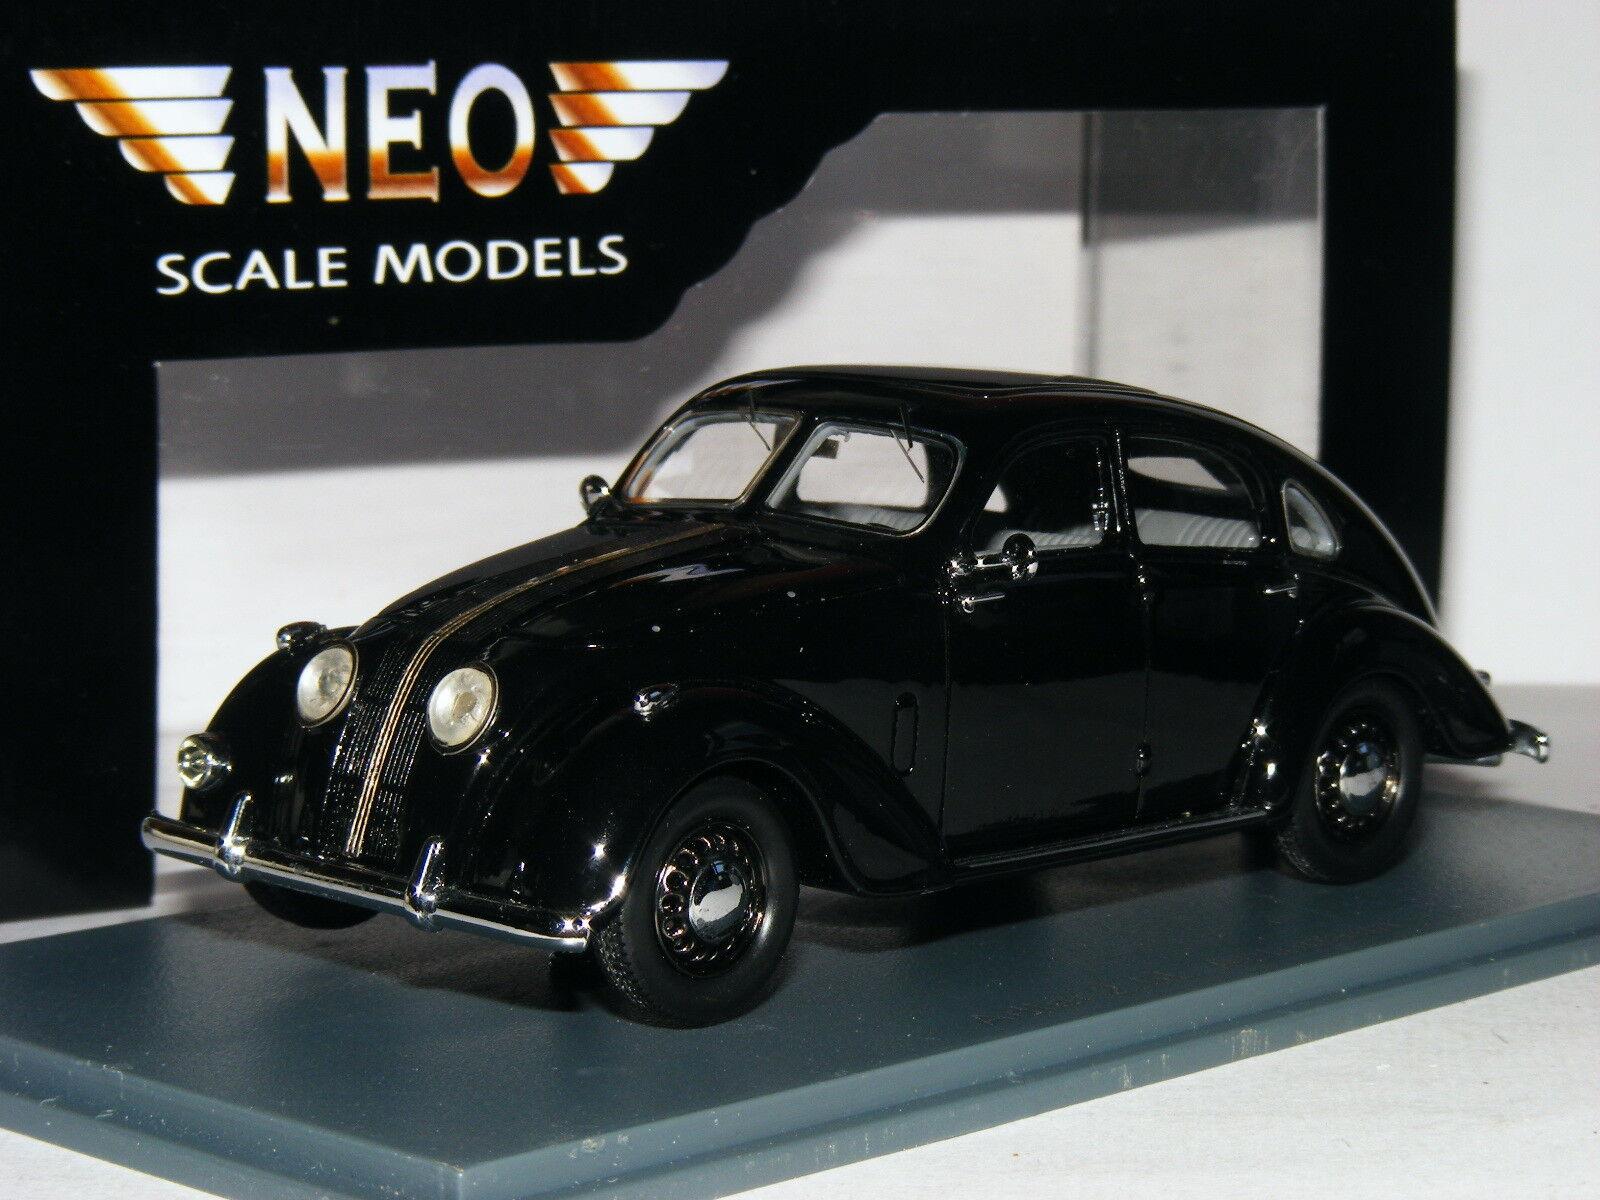 Neo Neo Neo 45025 1937 Adler 2.5 Litro Autobahn Sedan Negro 1 43 e37e72